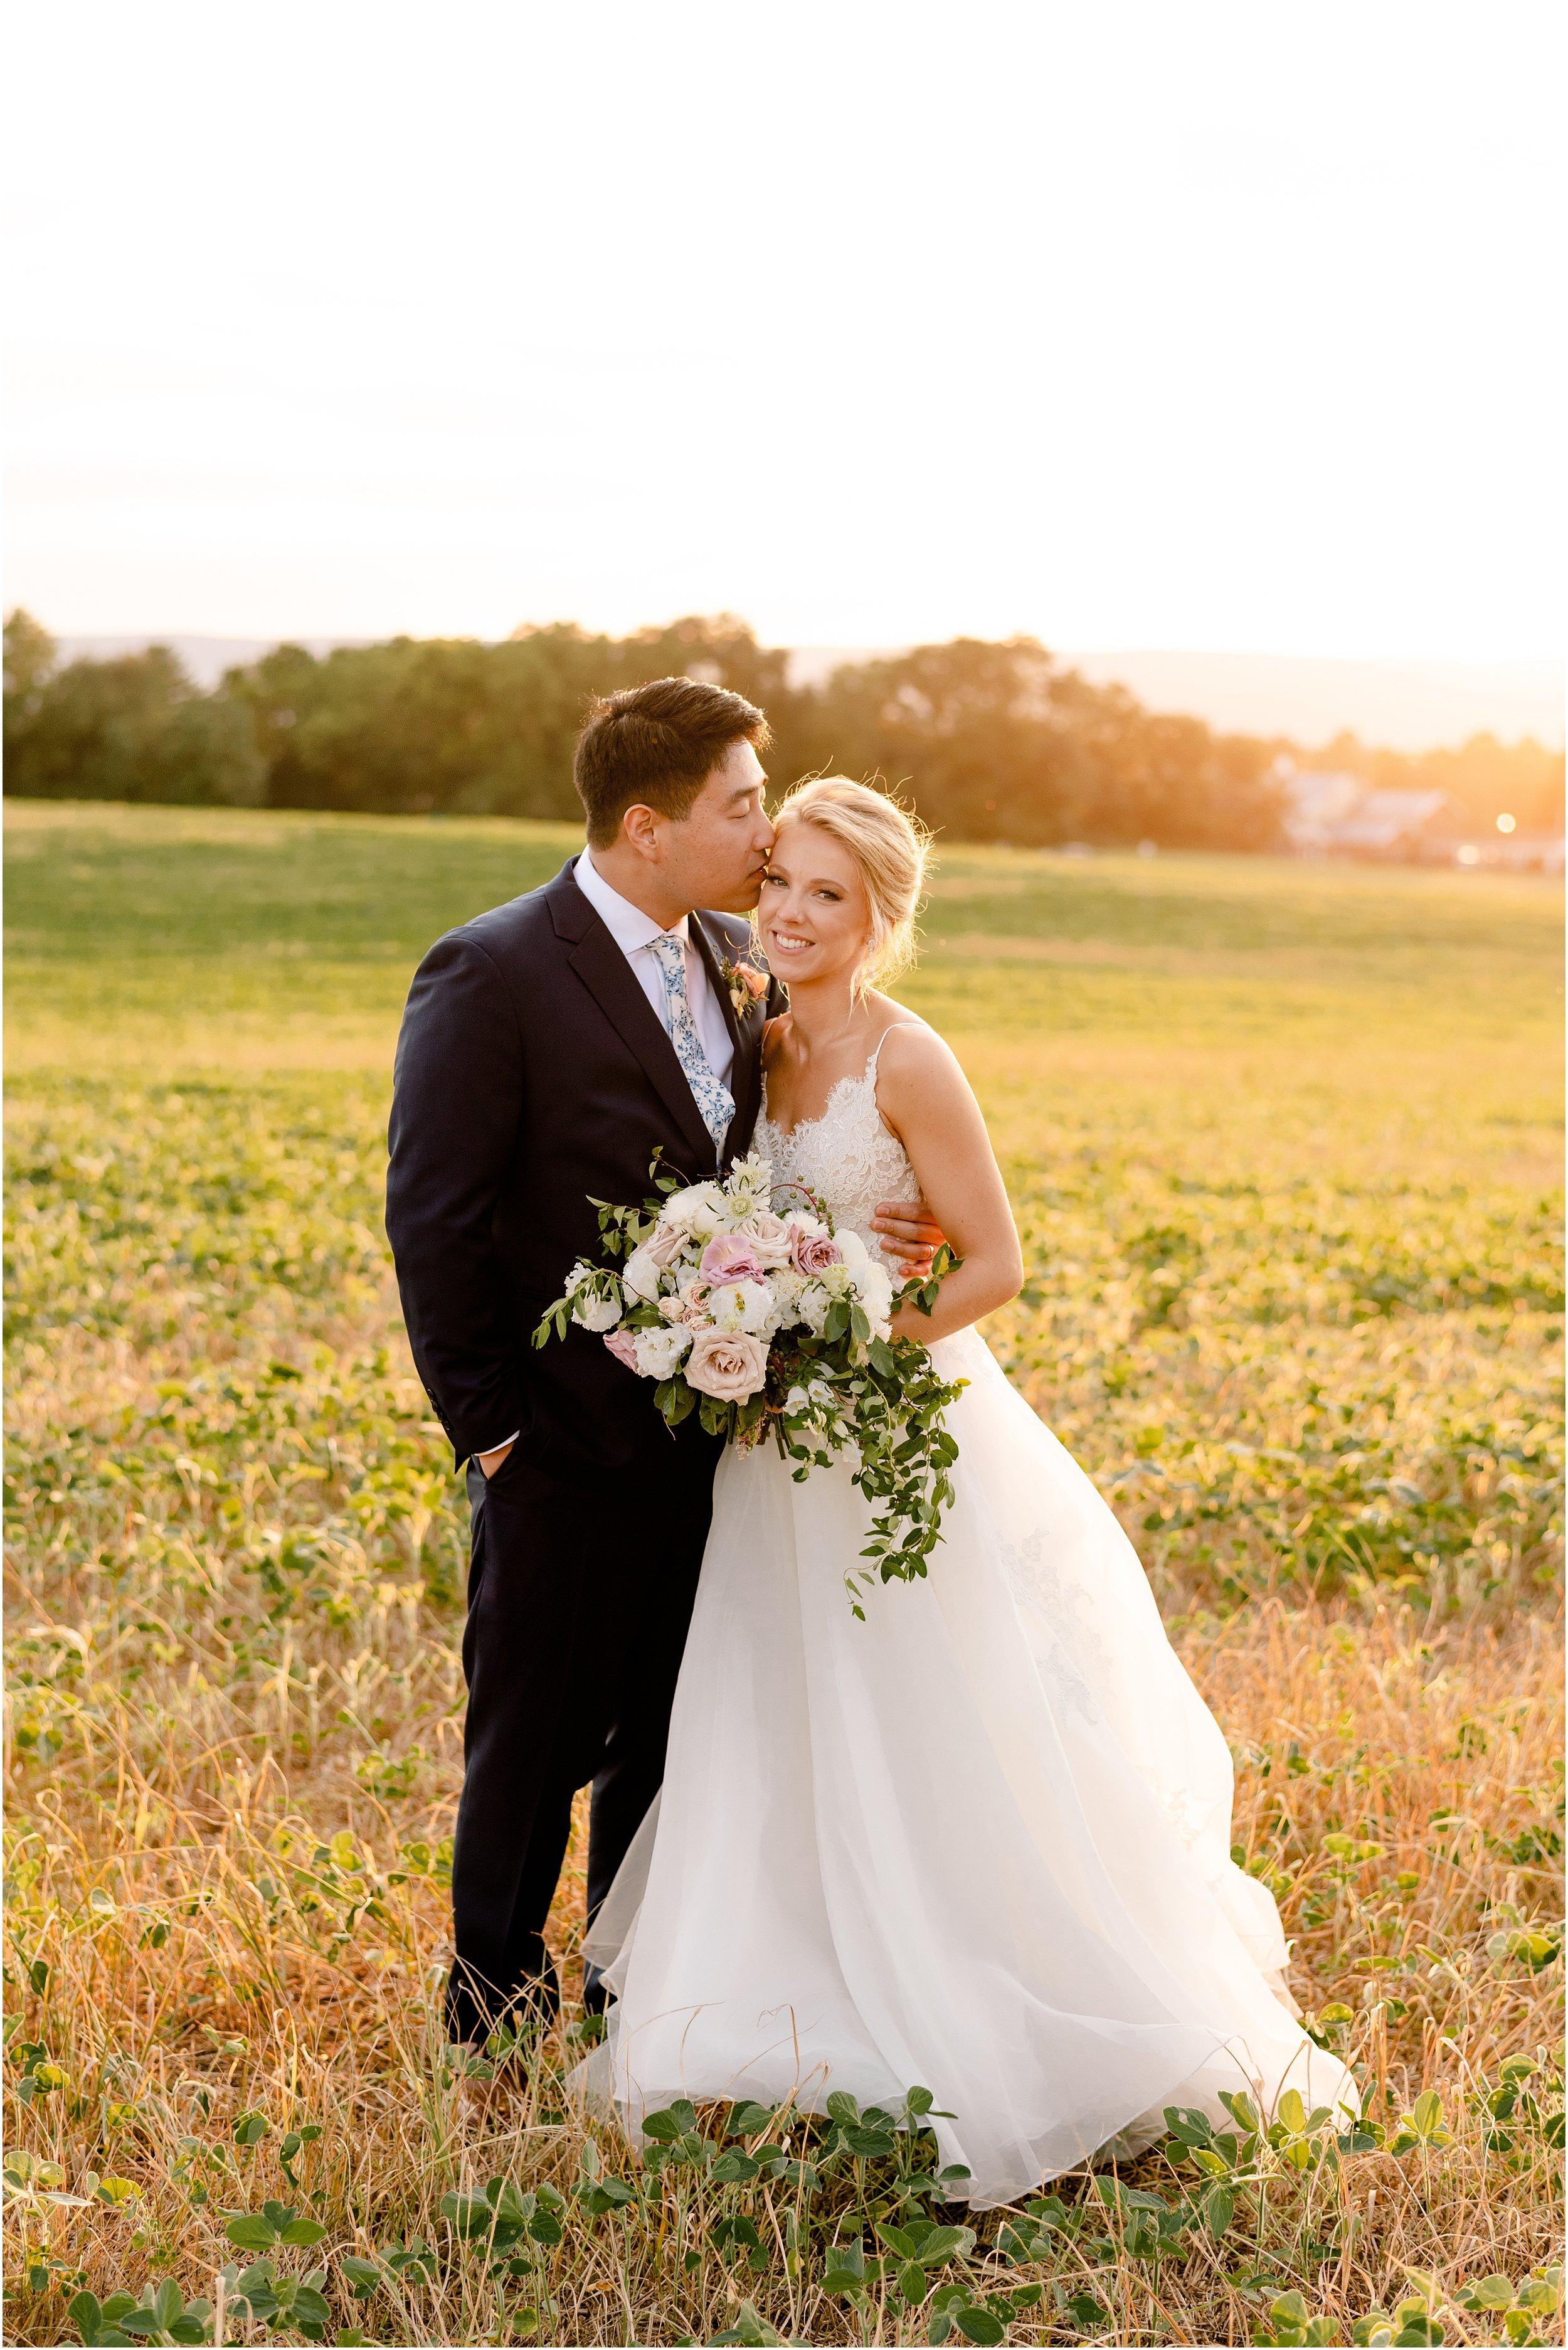 hannah leigh photography Walkers Overlook Wedding Walkersville MD_3550.jpg